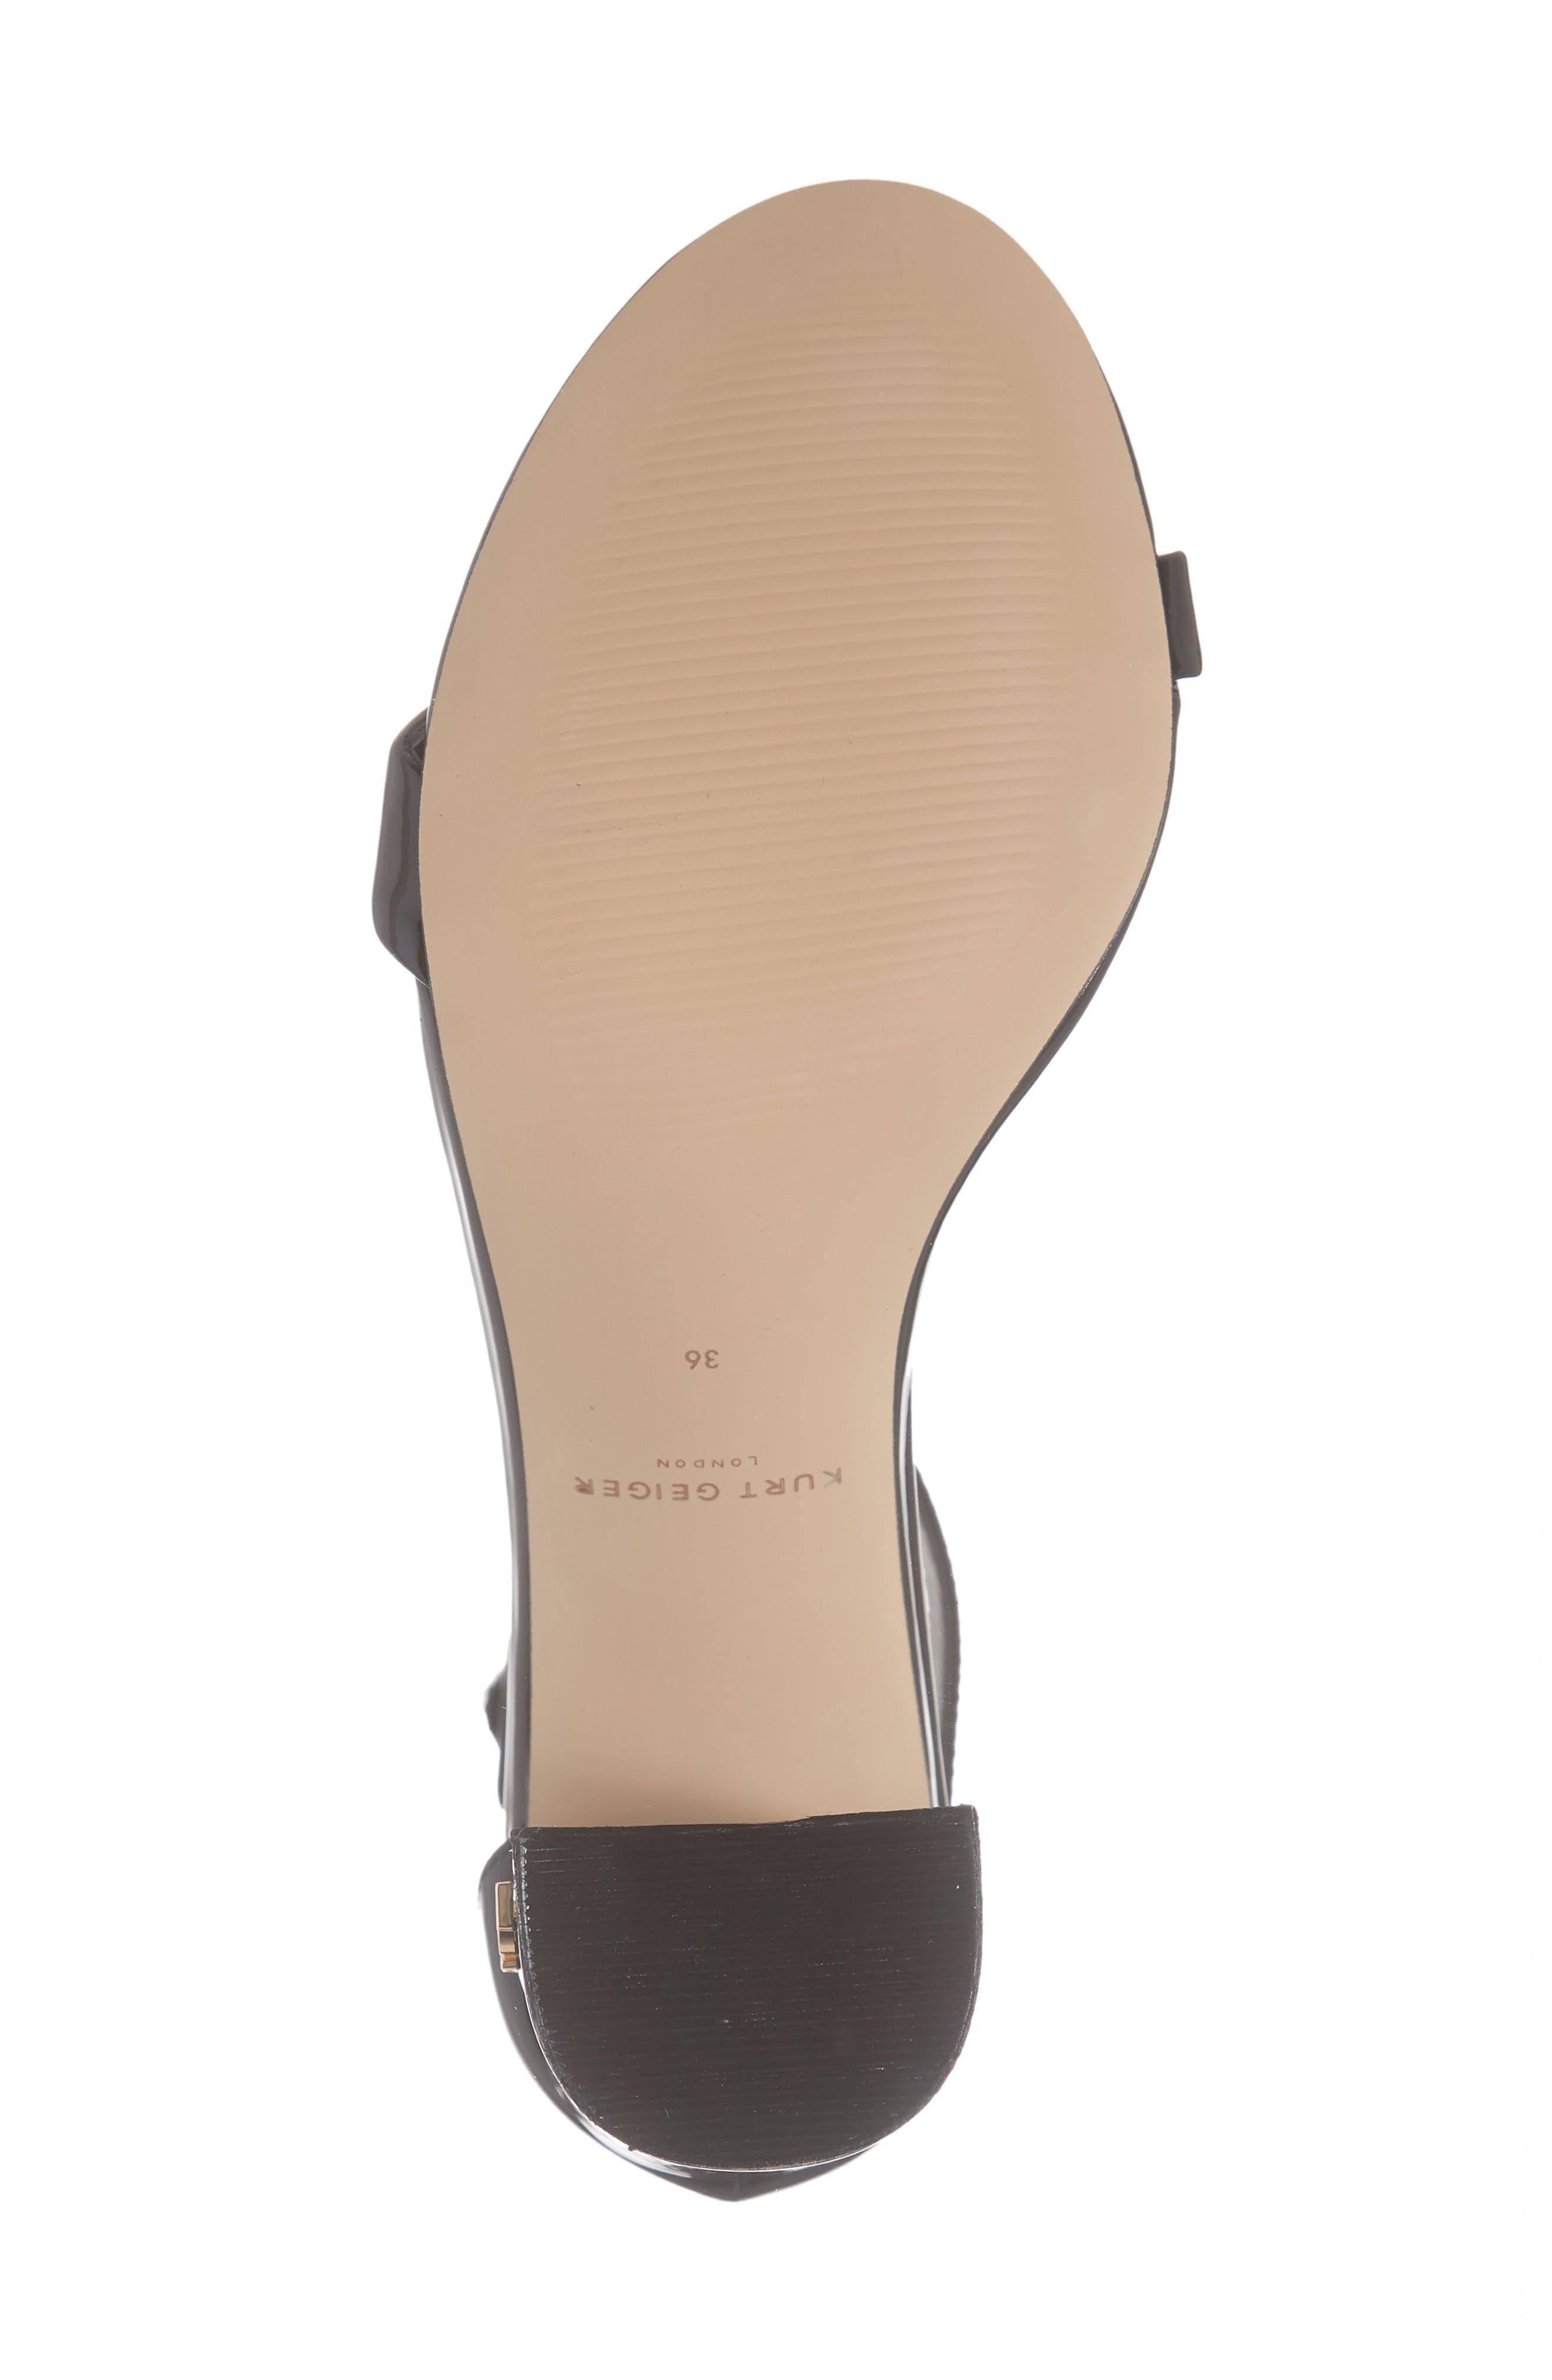 Langley Ankle Strap Sandal,                             Alternate thumbnail 6, color,                             BLACK LEATHER